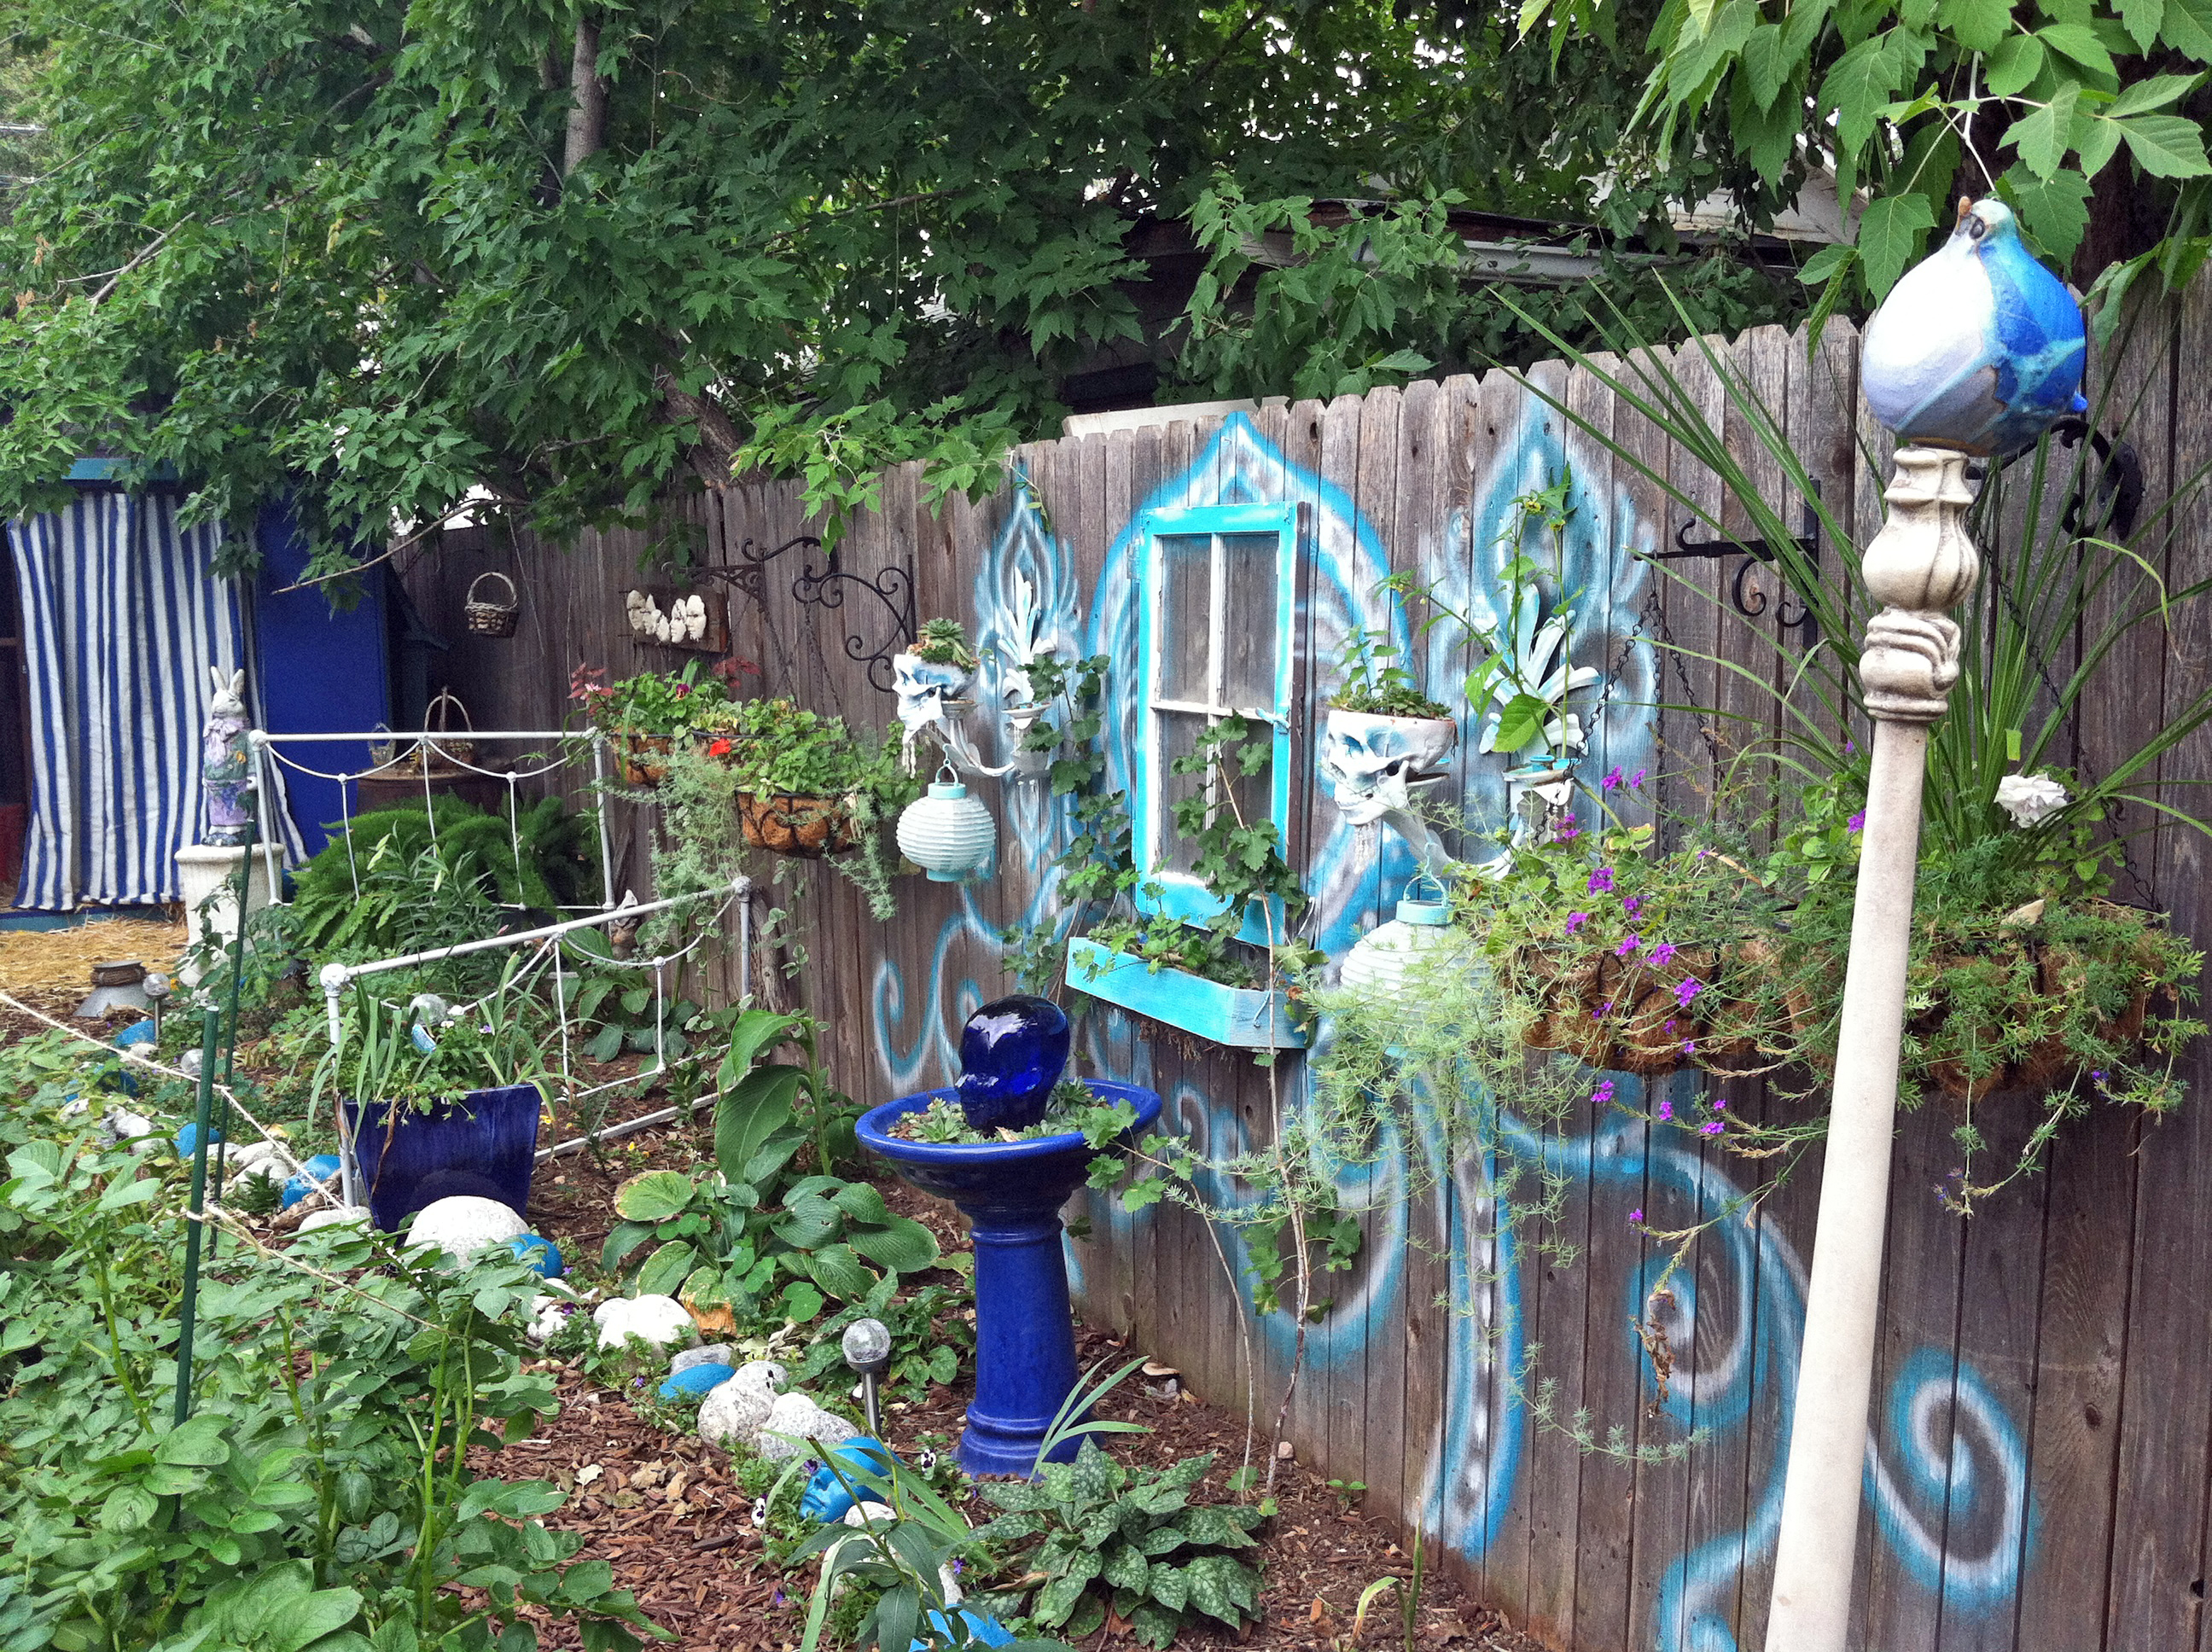 Glass yard art flowers - Part 2 Big Crazy Bohemian Garden It S Not Mine It S Tiffany